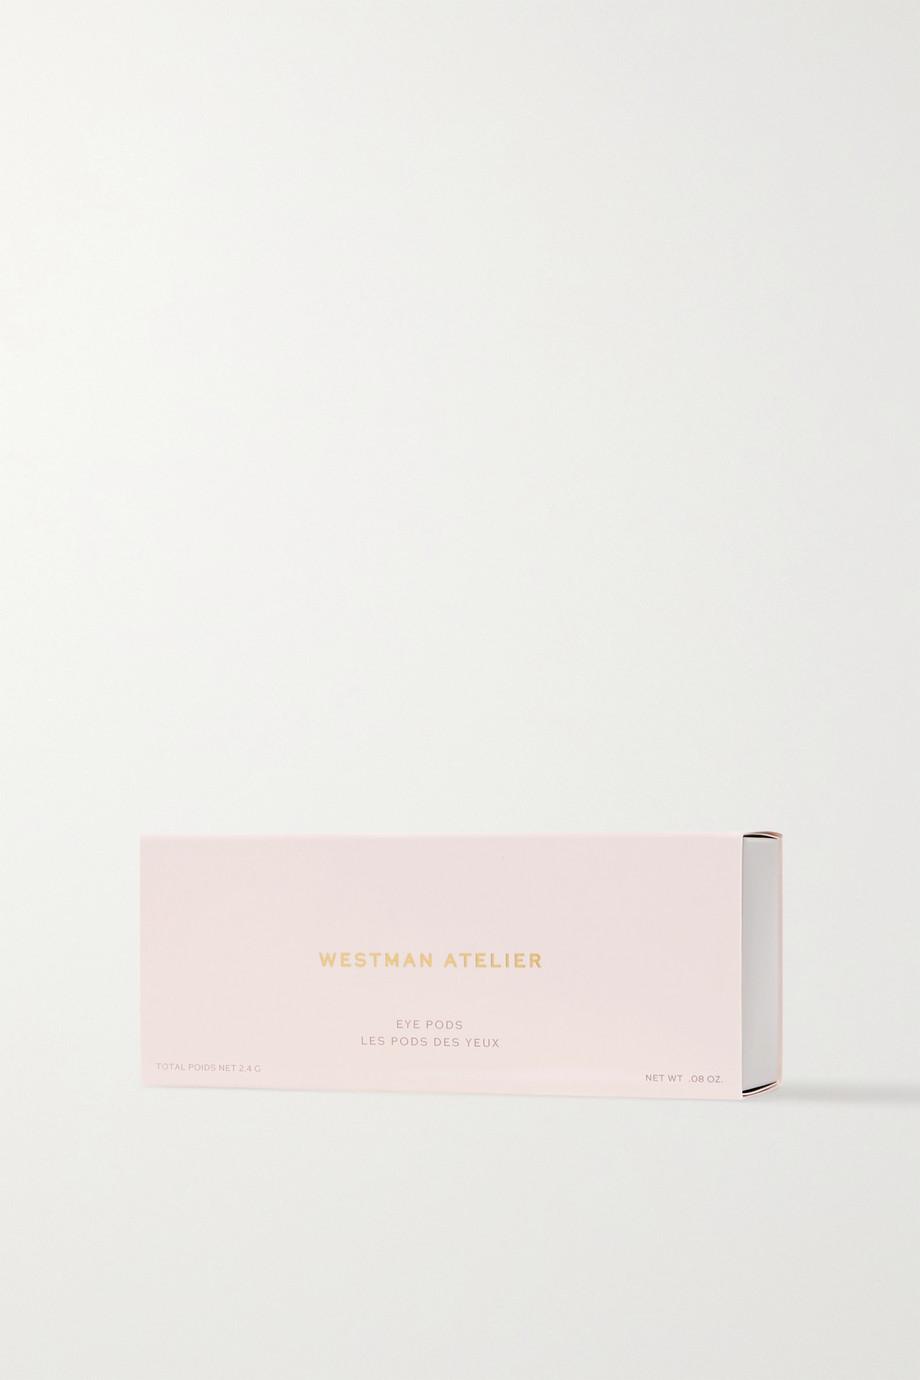 Westman Atelier Eye Pods - Noir, Champagne, Vin Rouge